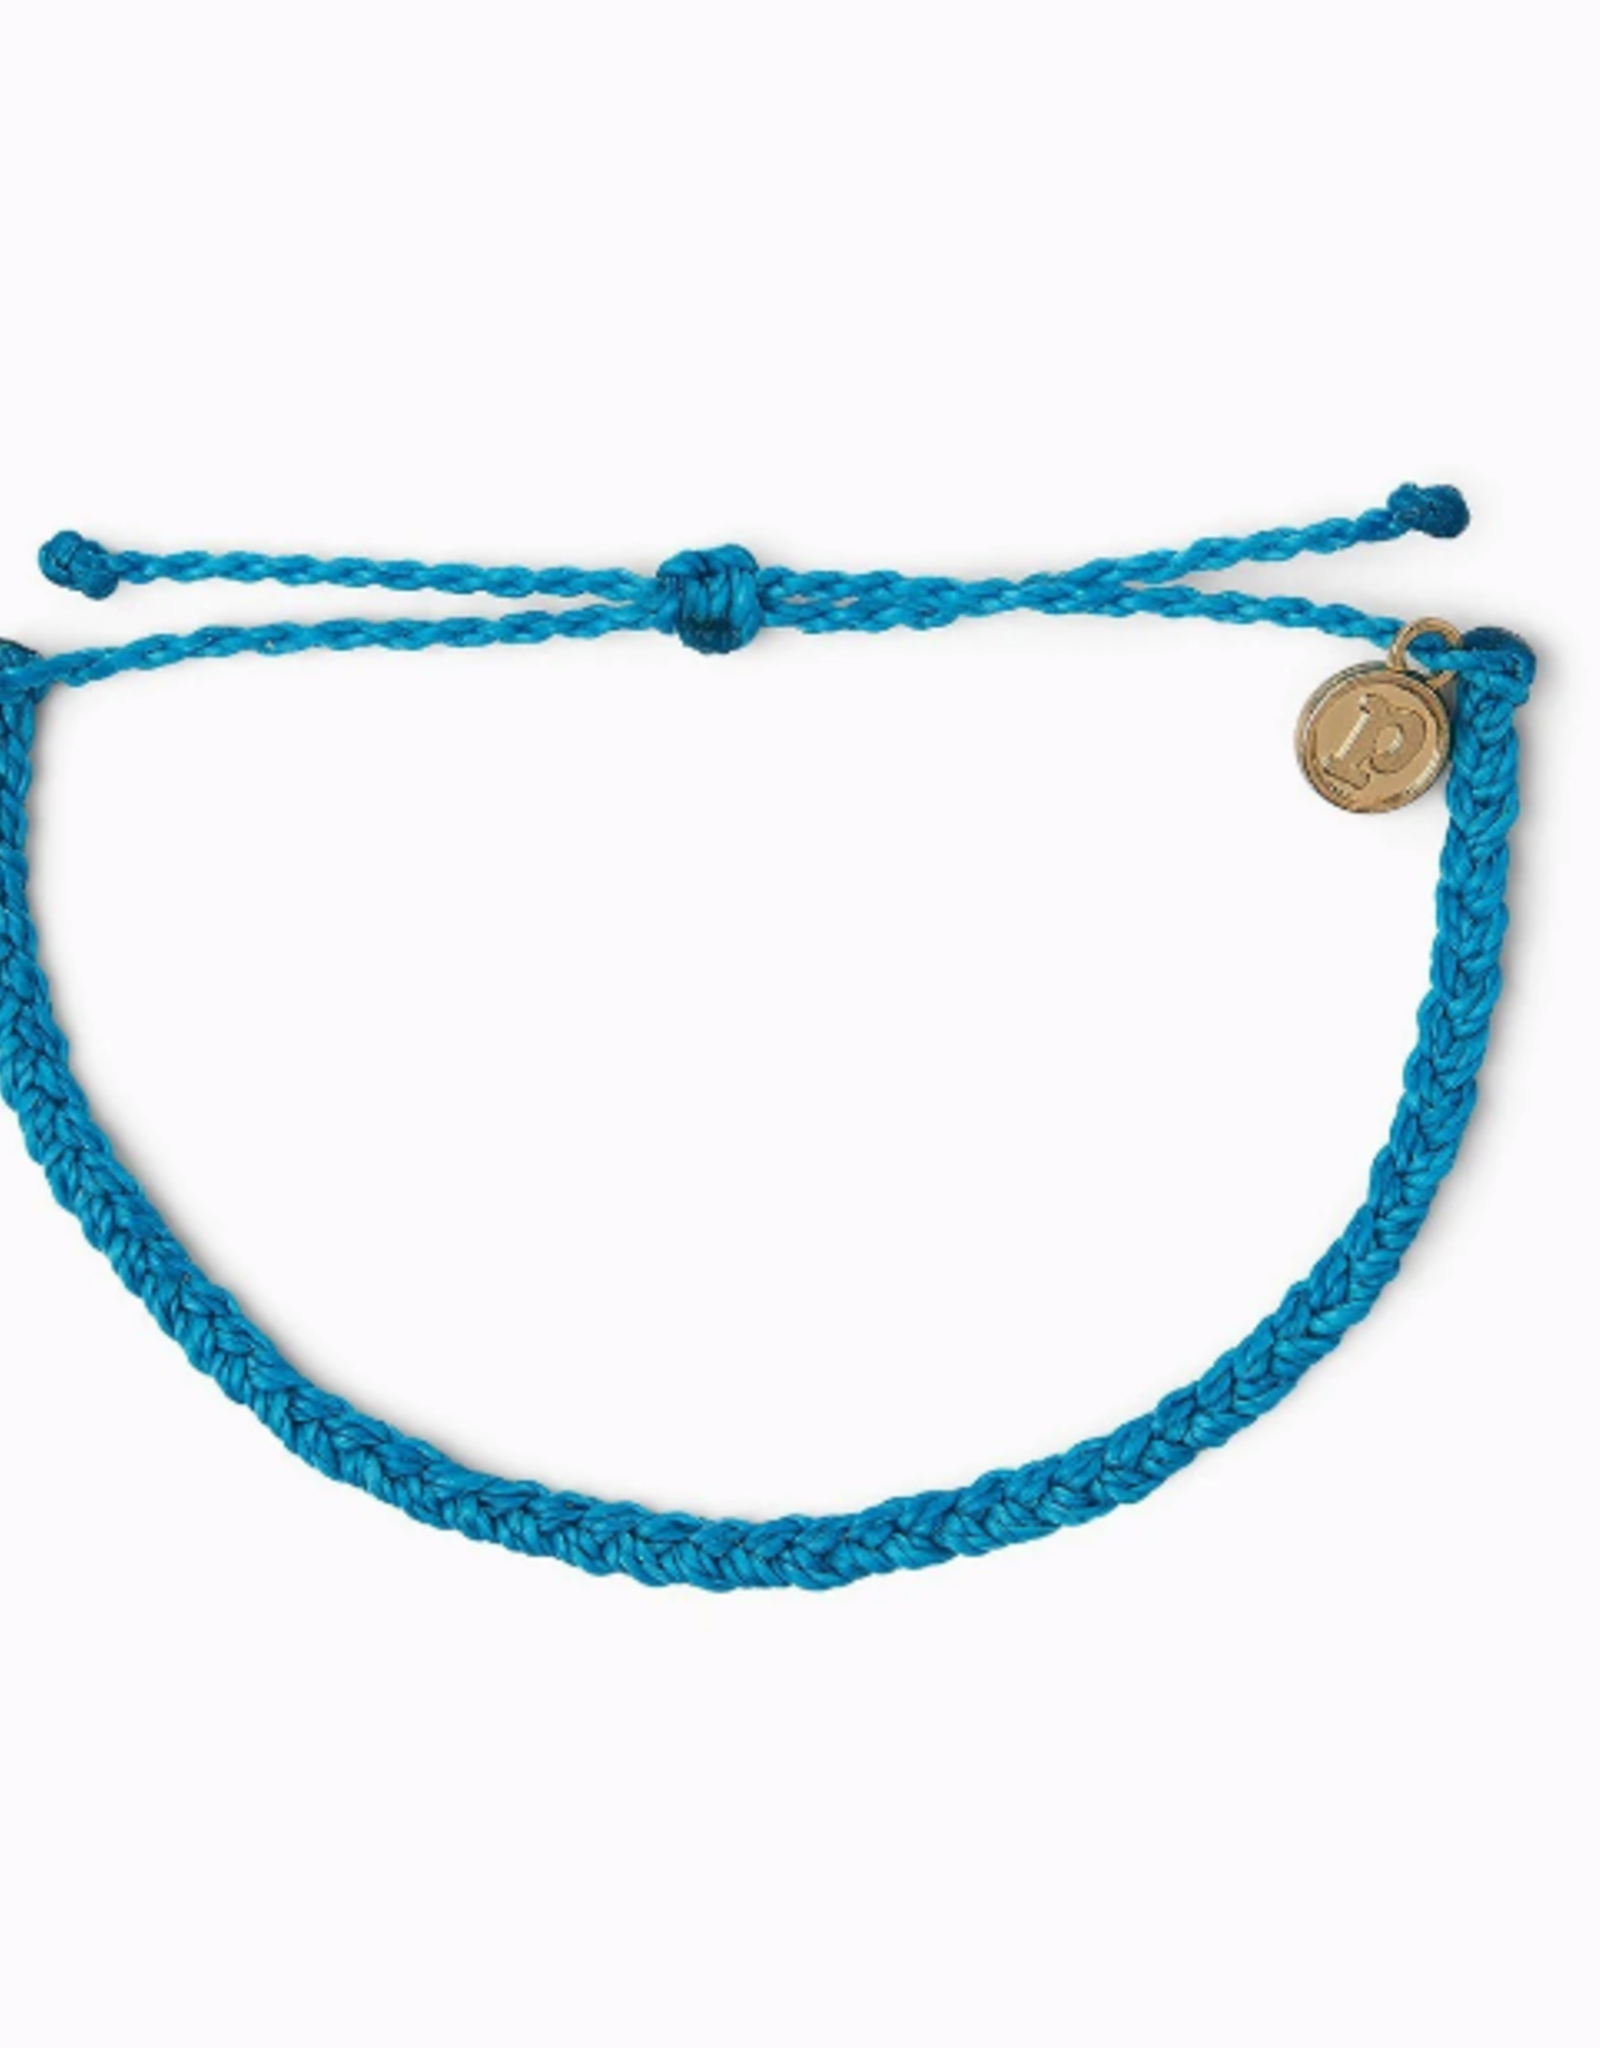 Pura Vida Pura Vida - Mini Braided Neon Blue Bracelet